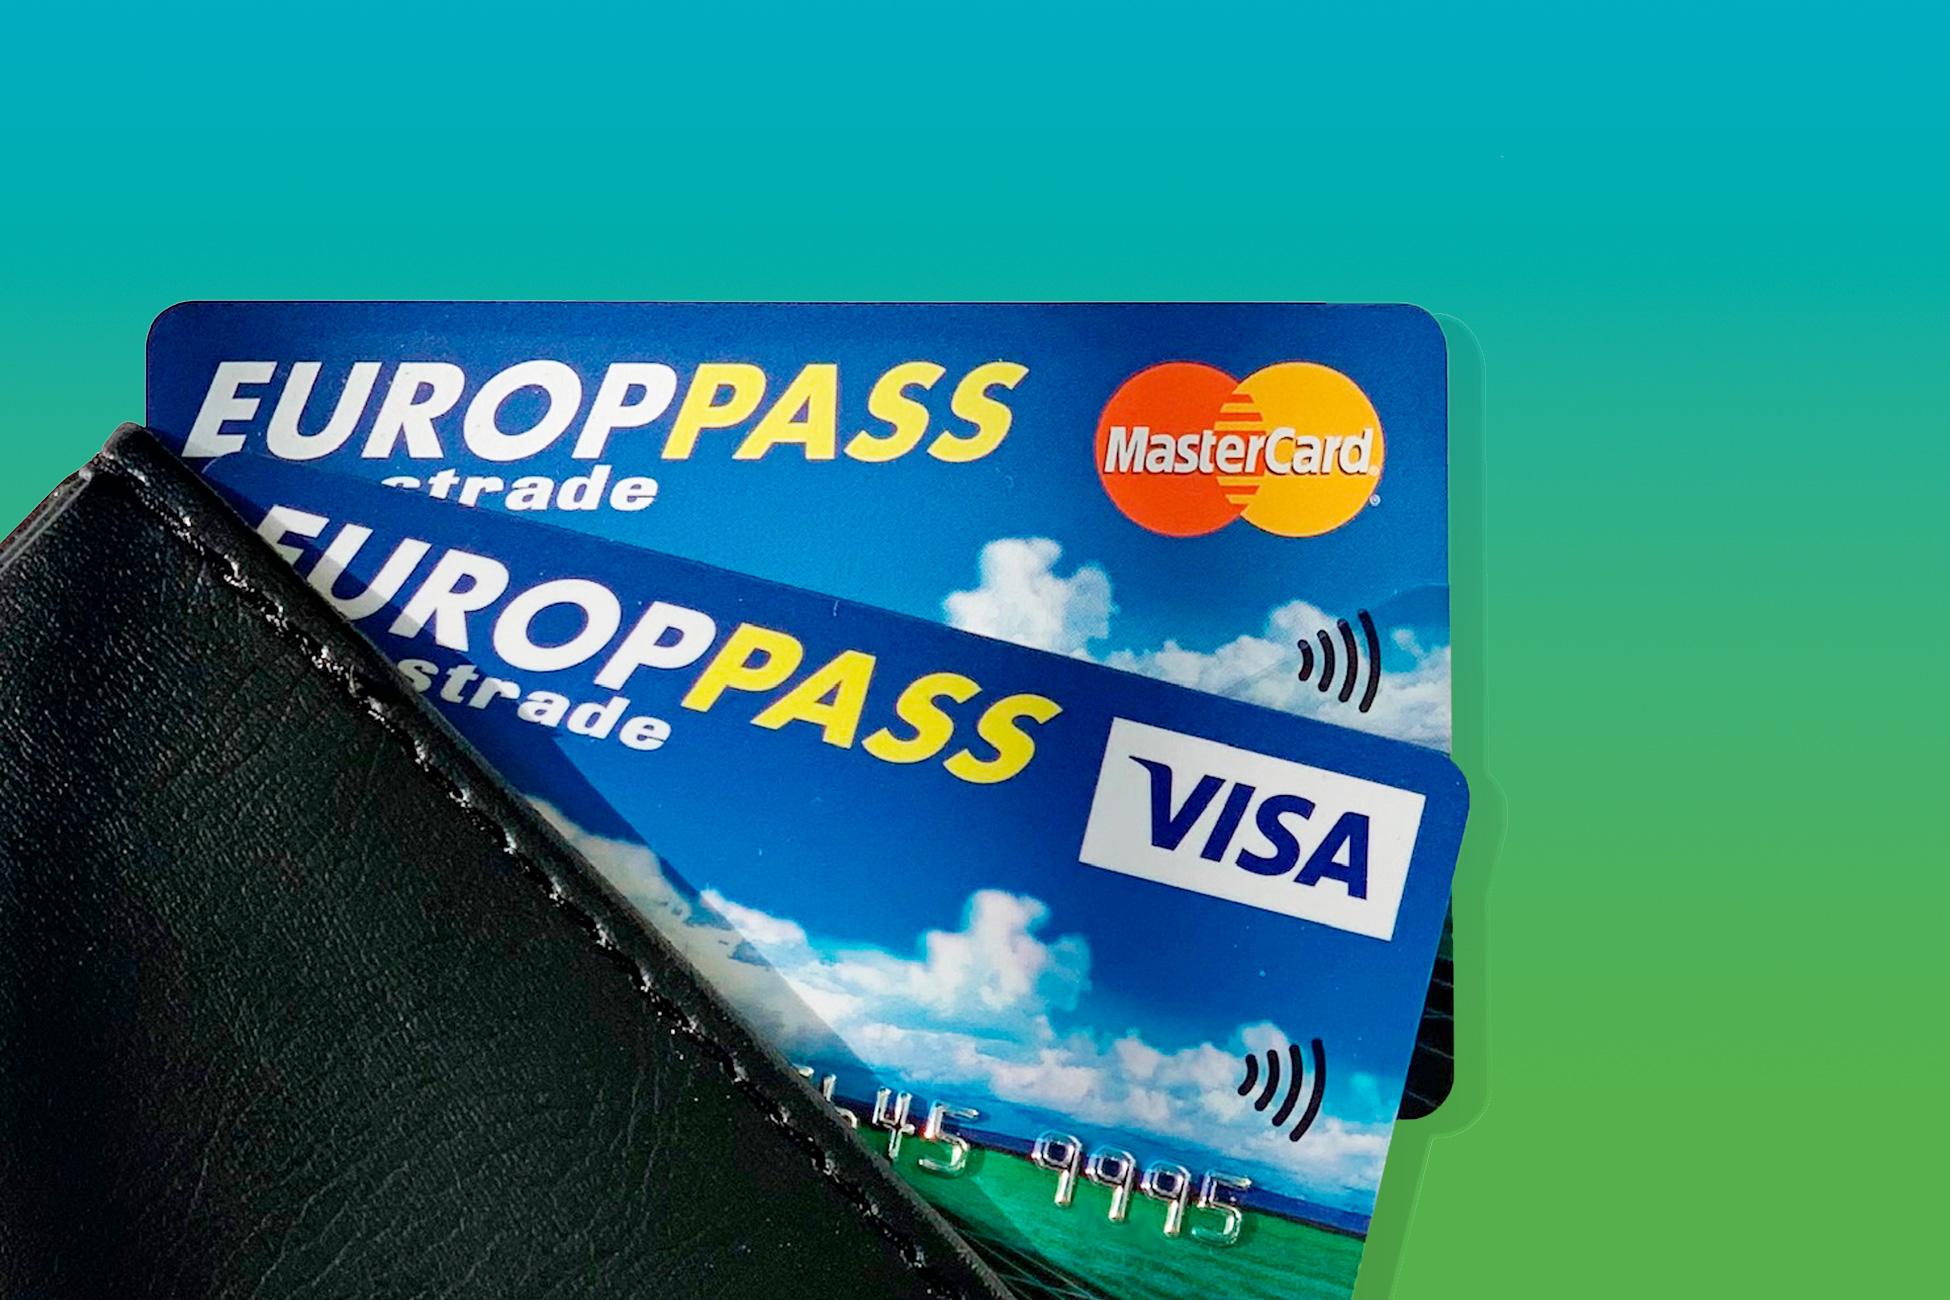 carta europass | Banca Valsabbina